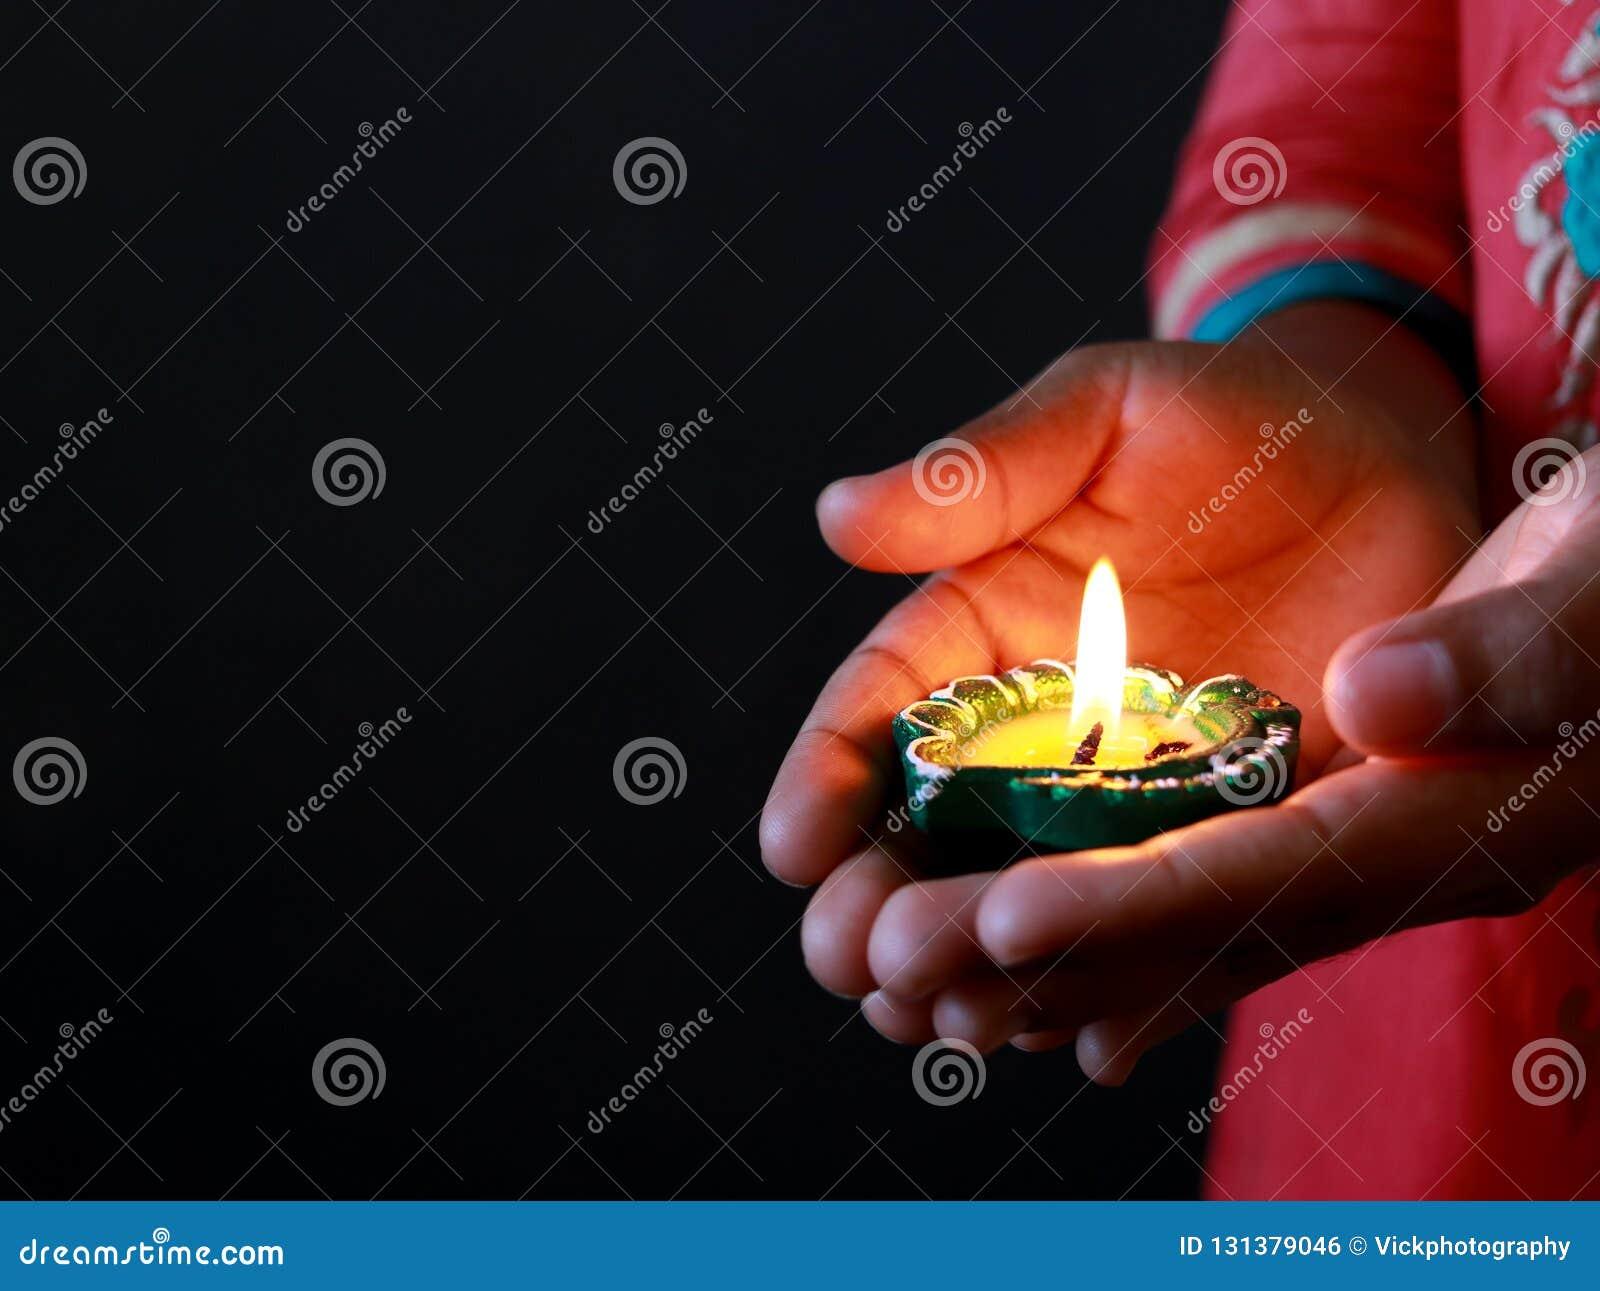 A Girl Holding Diya In Her Hand To Celebrate Diwali Stock